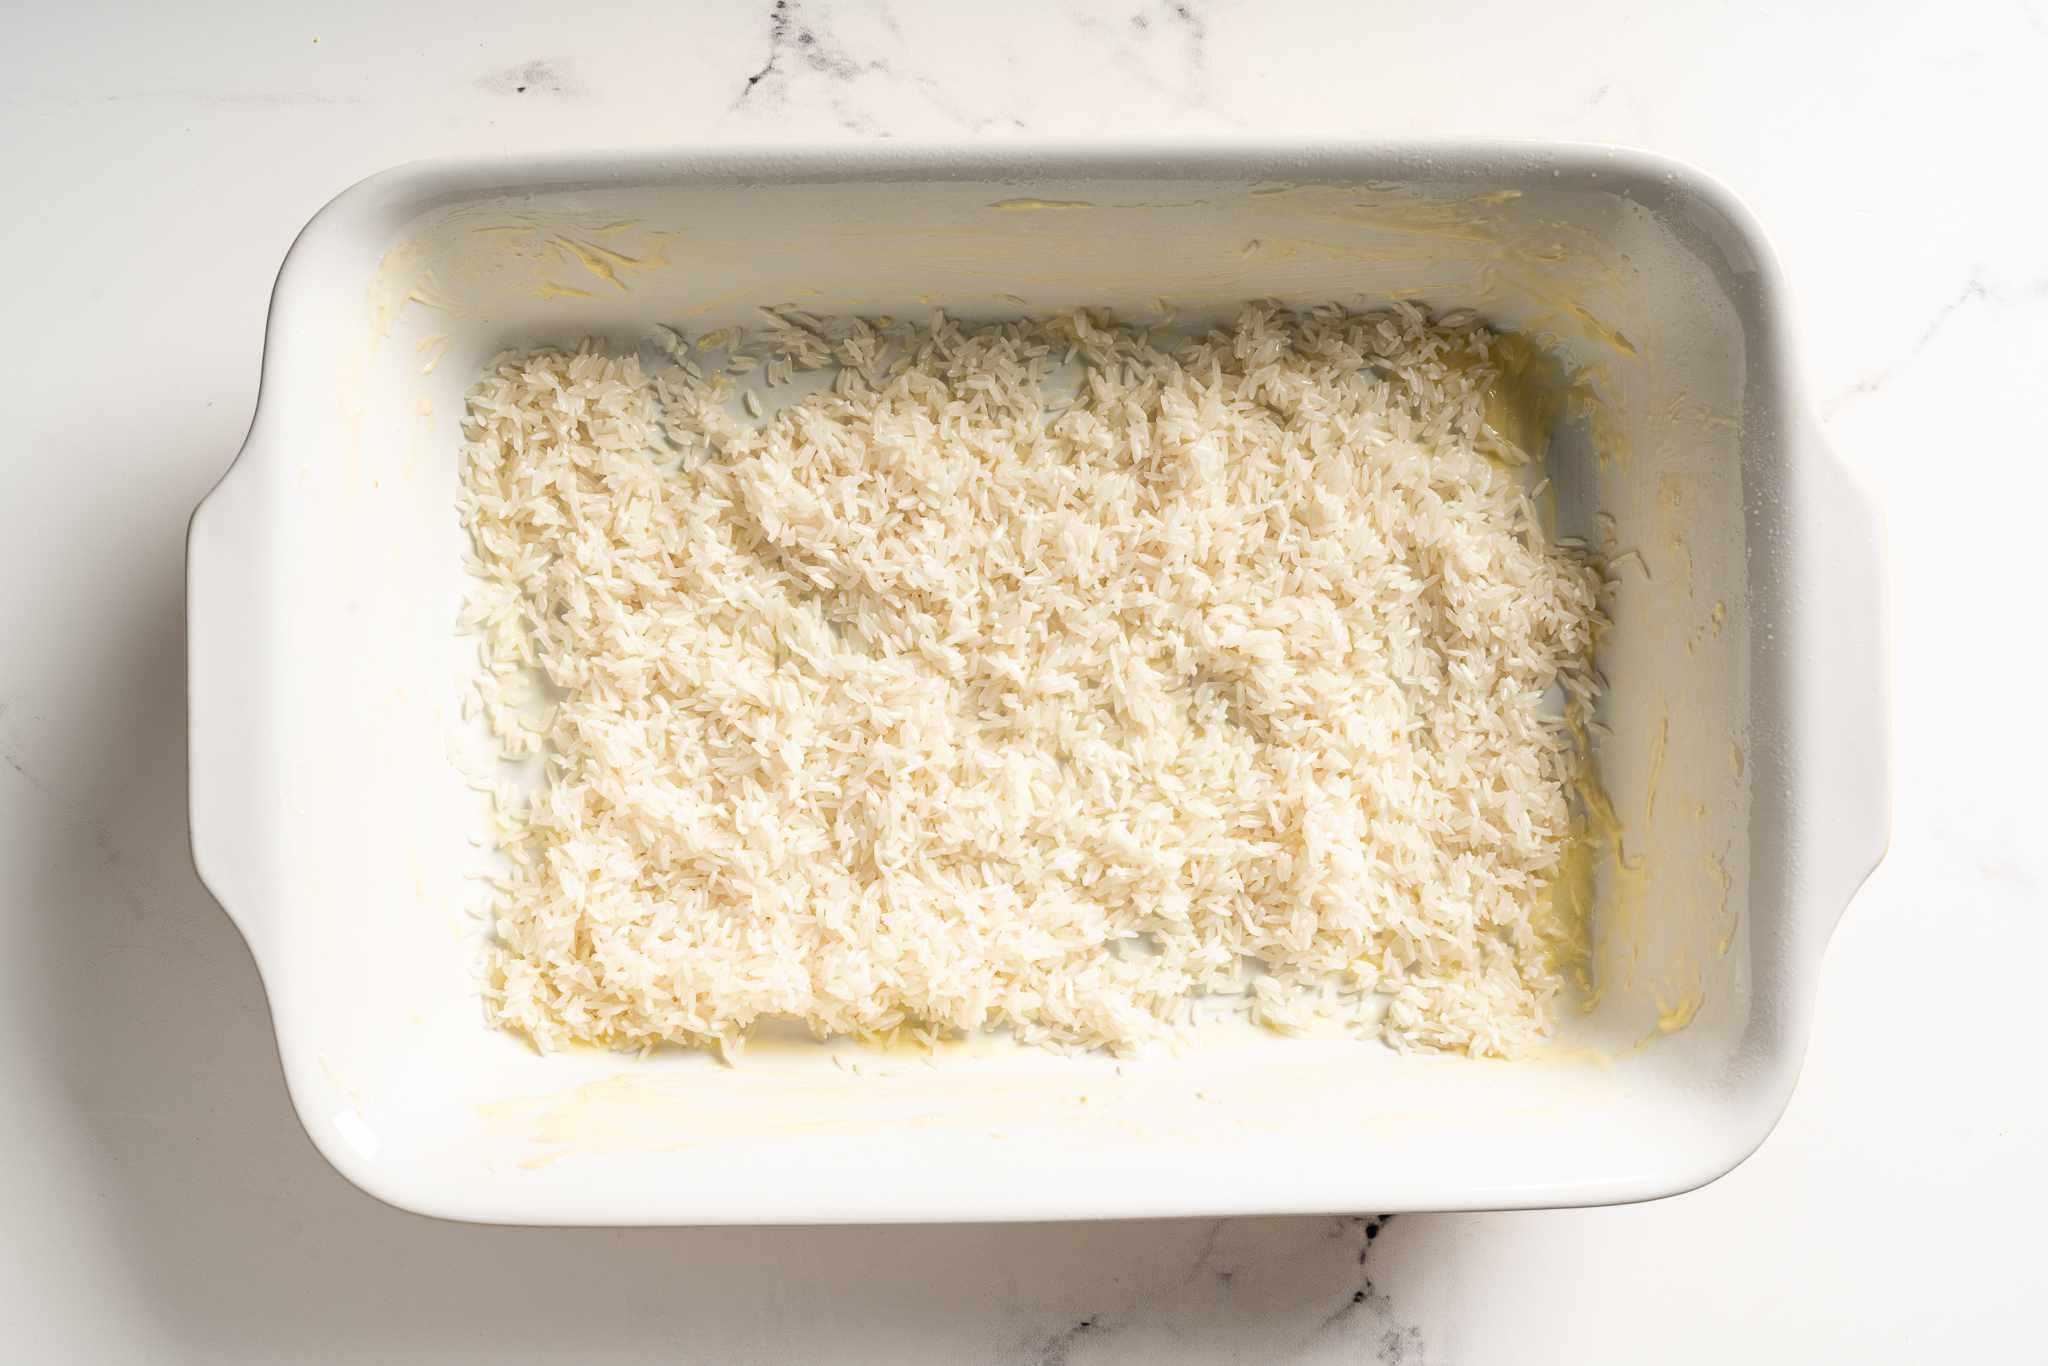 Rice in a casserole dish